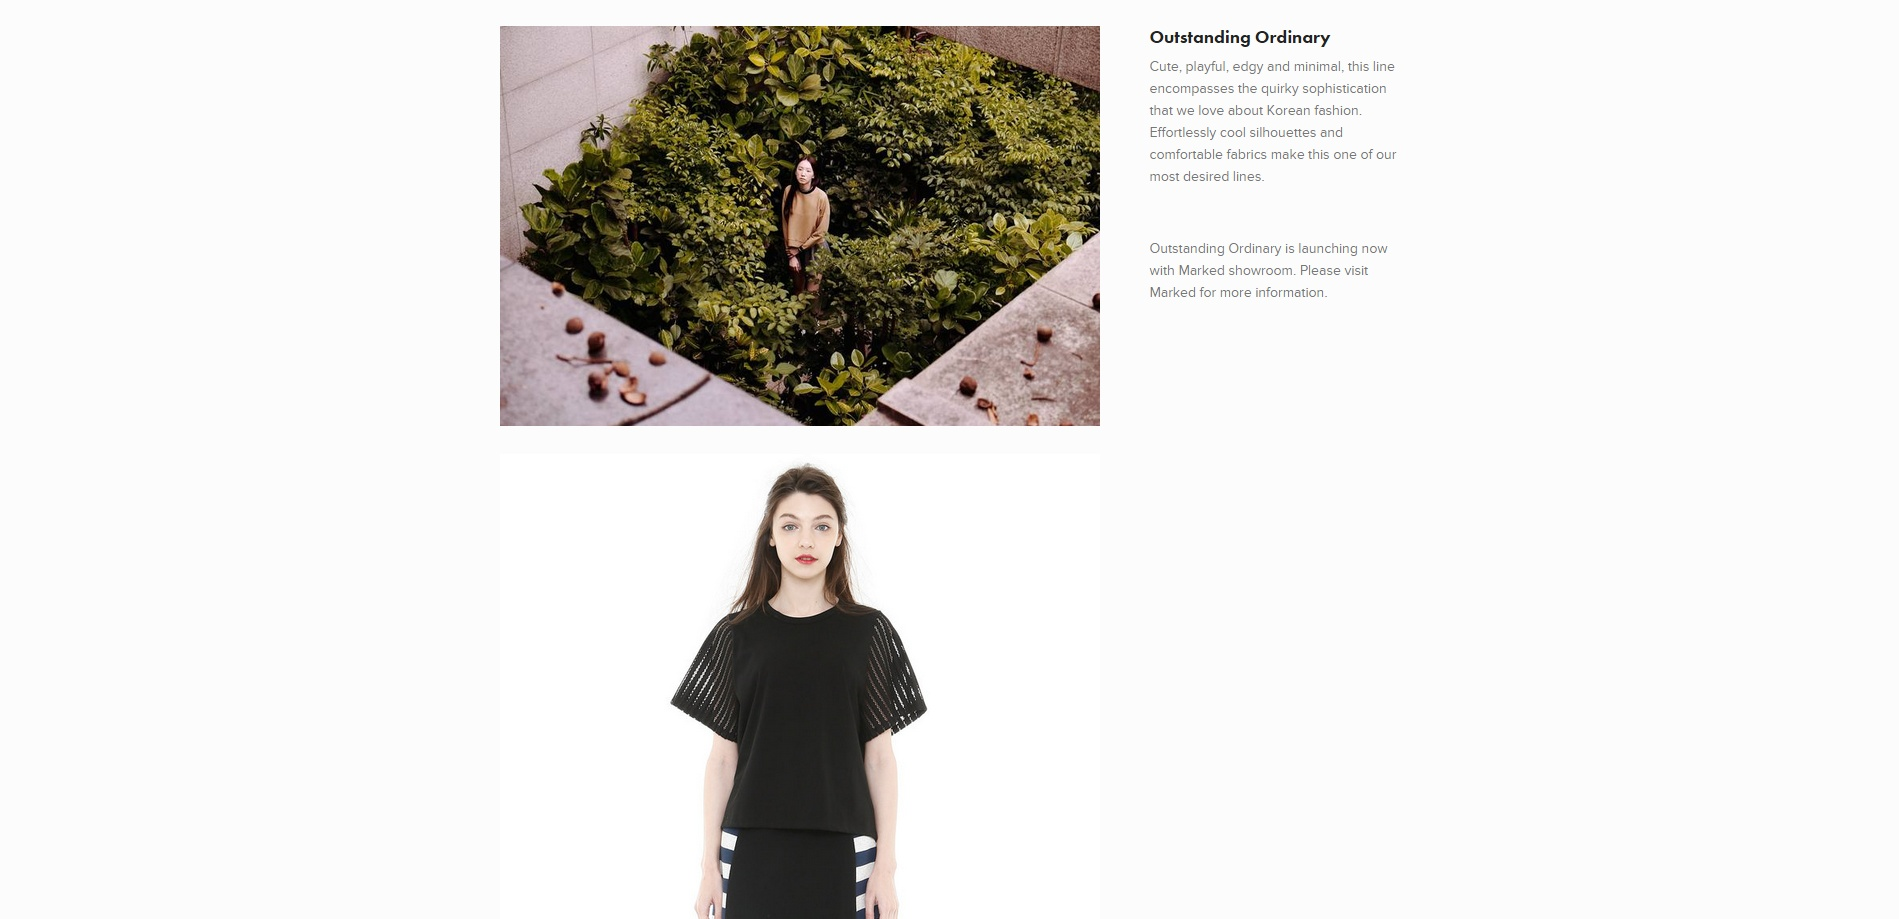 MATTSONCONTEMPORARYMattson Distribution- Contemporary Fashion.clipular (1).png